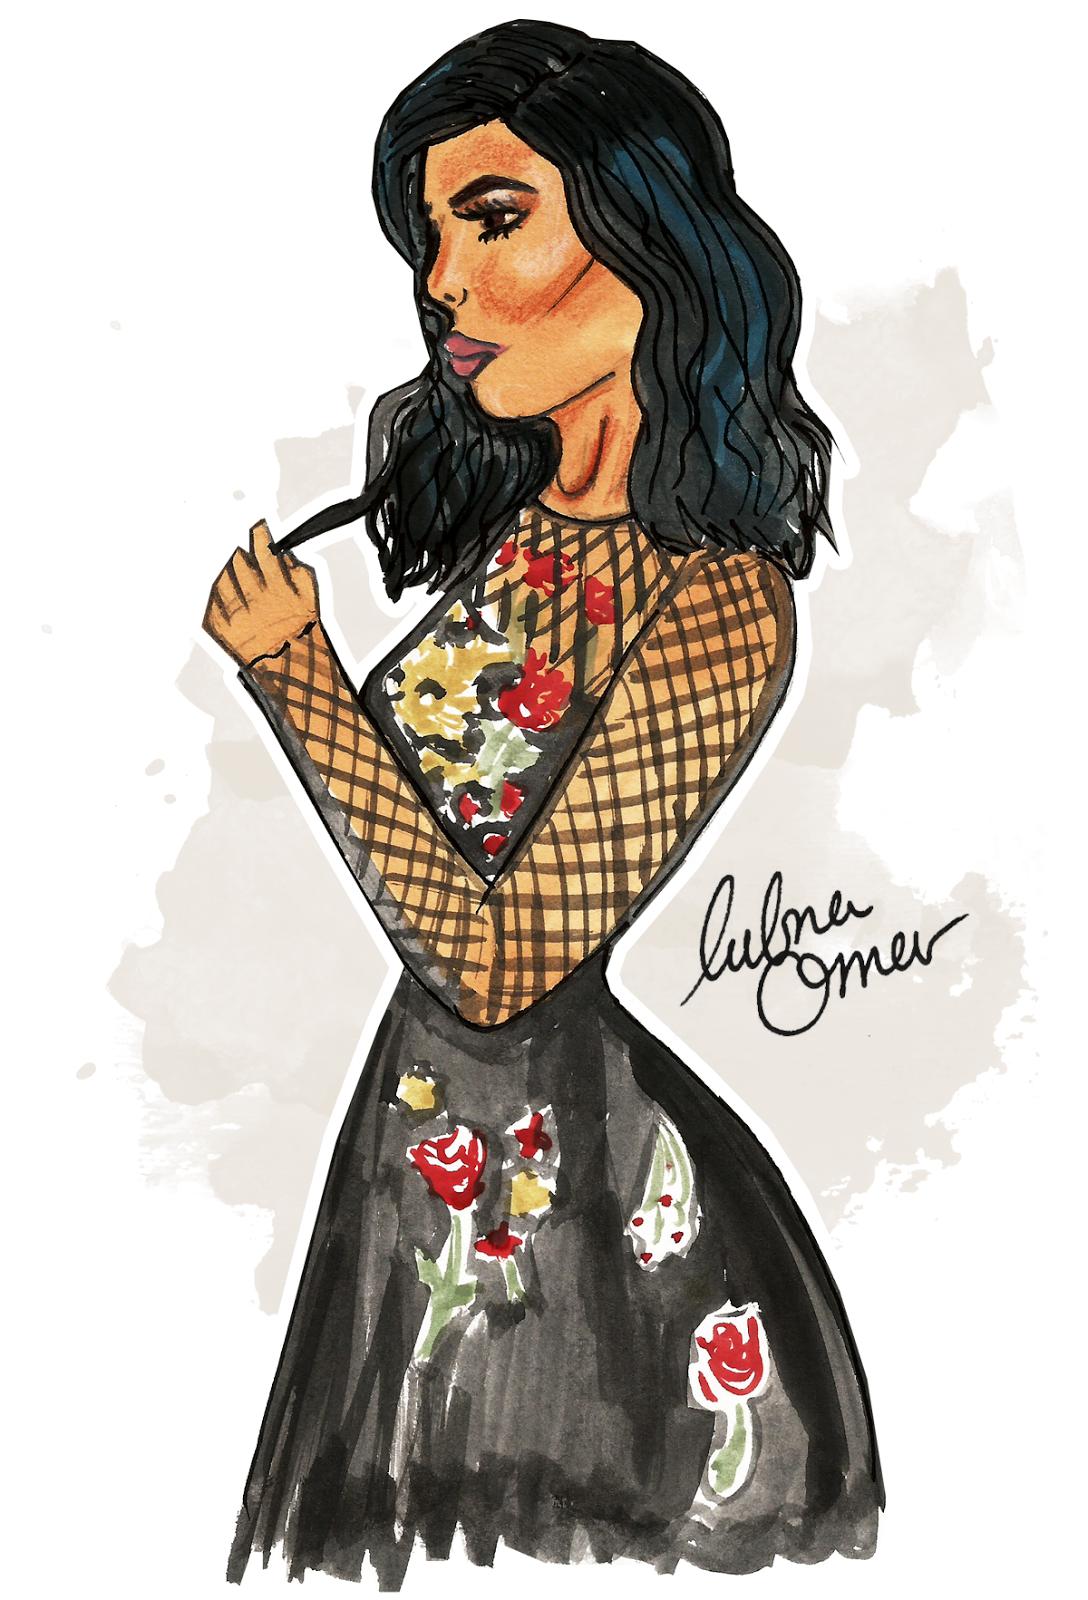 Kylie Jenner illustration by Lubna Omar